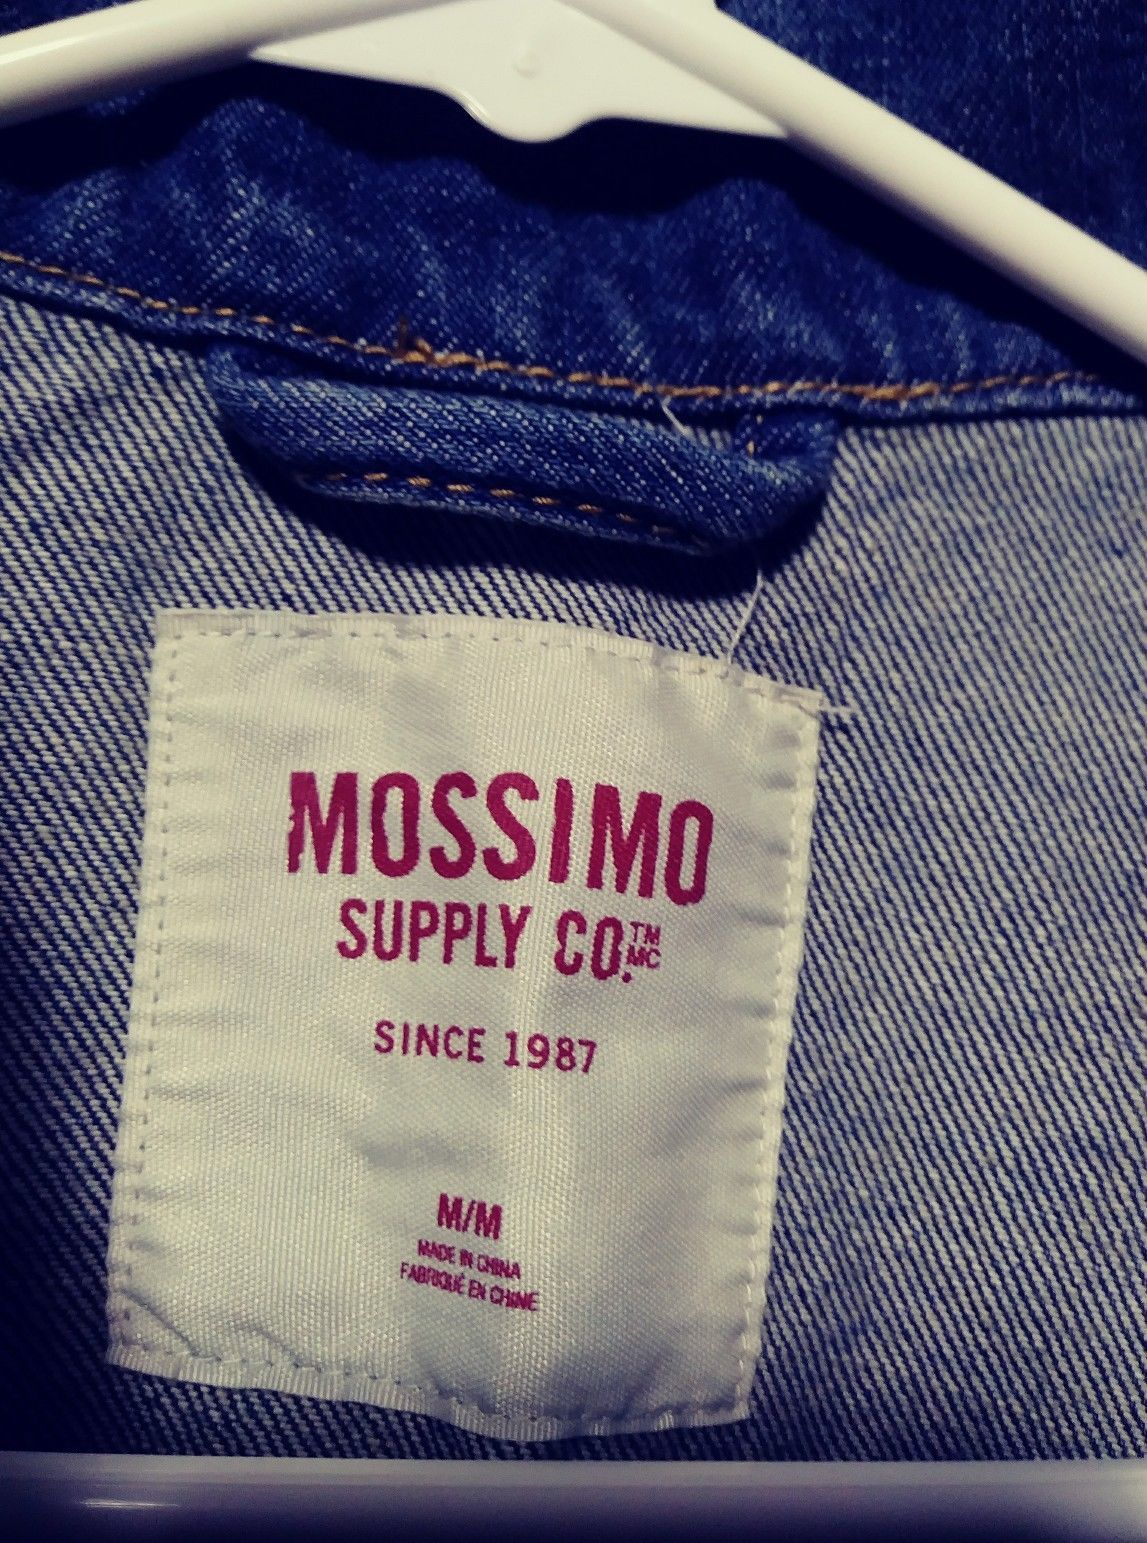 613c96a4fc Mossimo Supply Co Juniors Jean Jacket Denim Sleeveless Vest Distressed  Medium